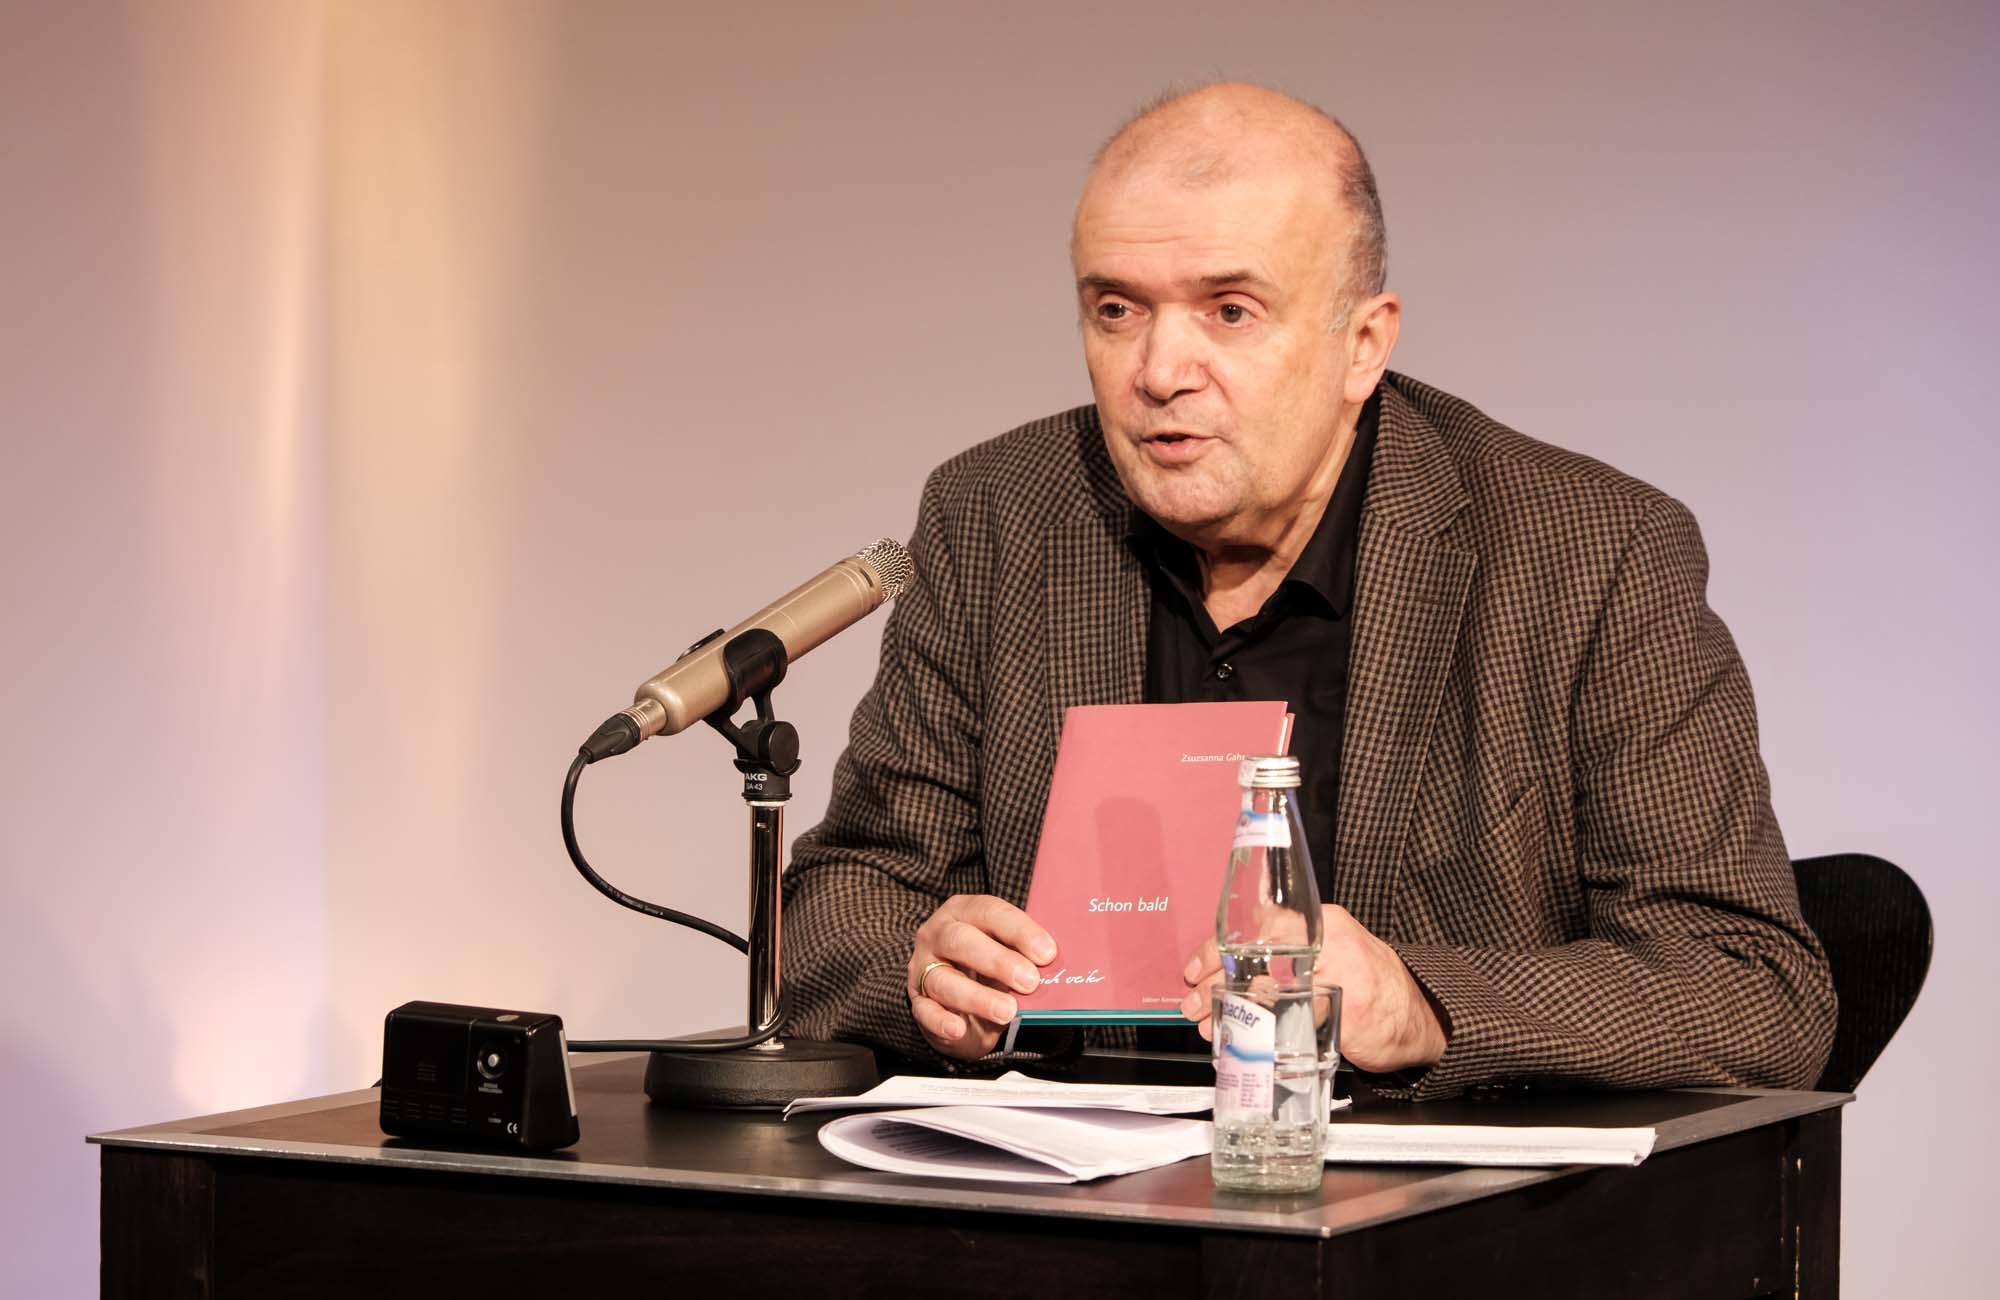 Zsuzsanna Gahse: Schon bald <br/>(c) Sebastian Wenzel